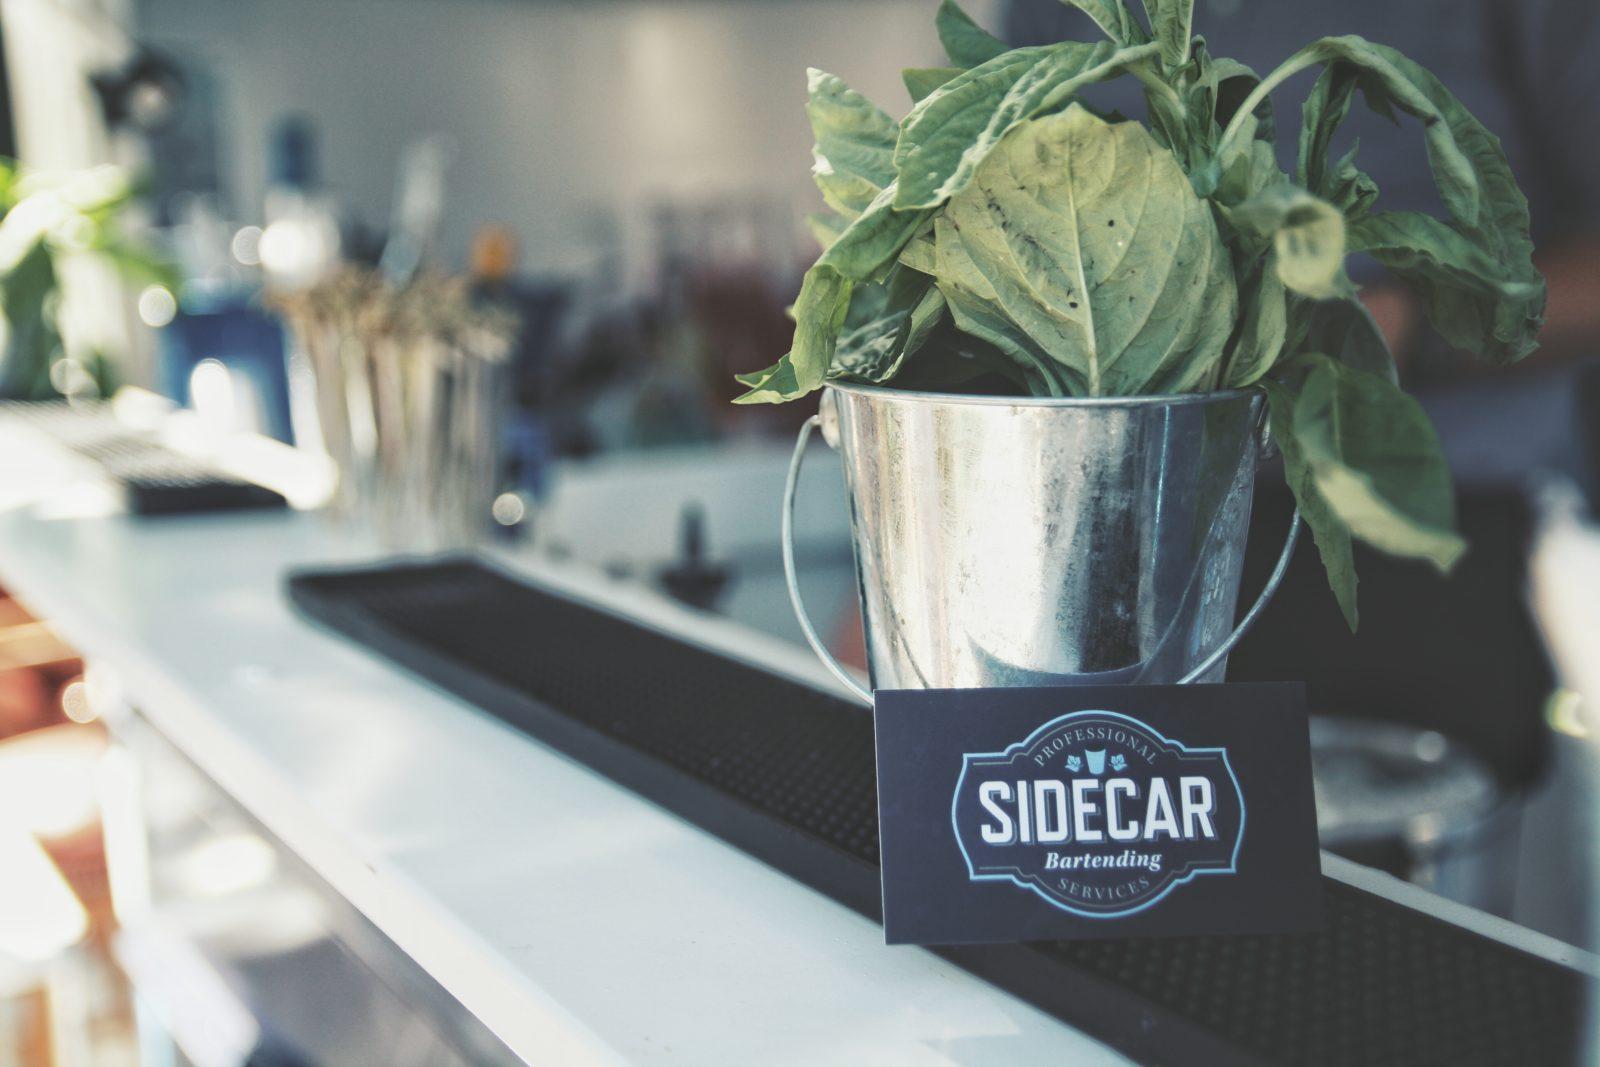 sidecar-ponybar-image-4